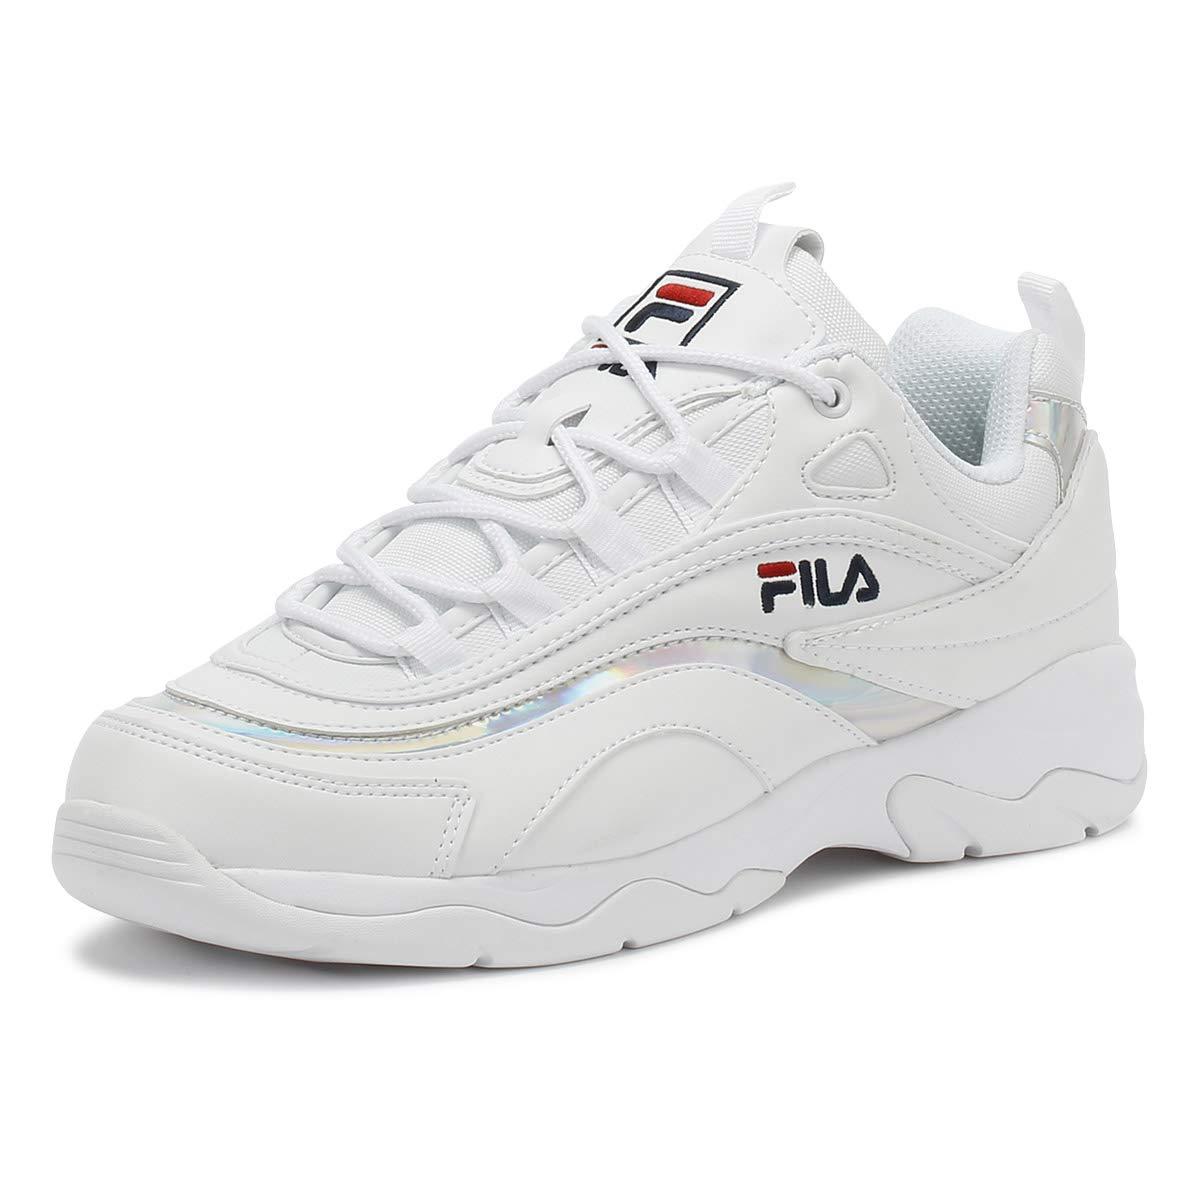 Fila Ray Damen Weiß/Metallic Silber Sneakers